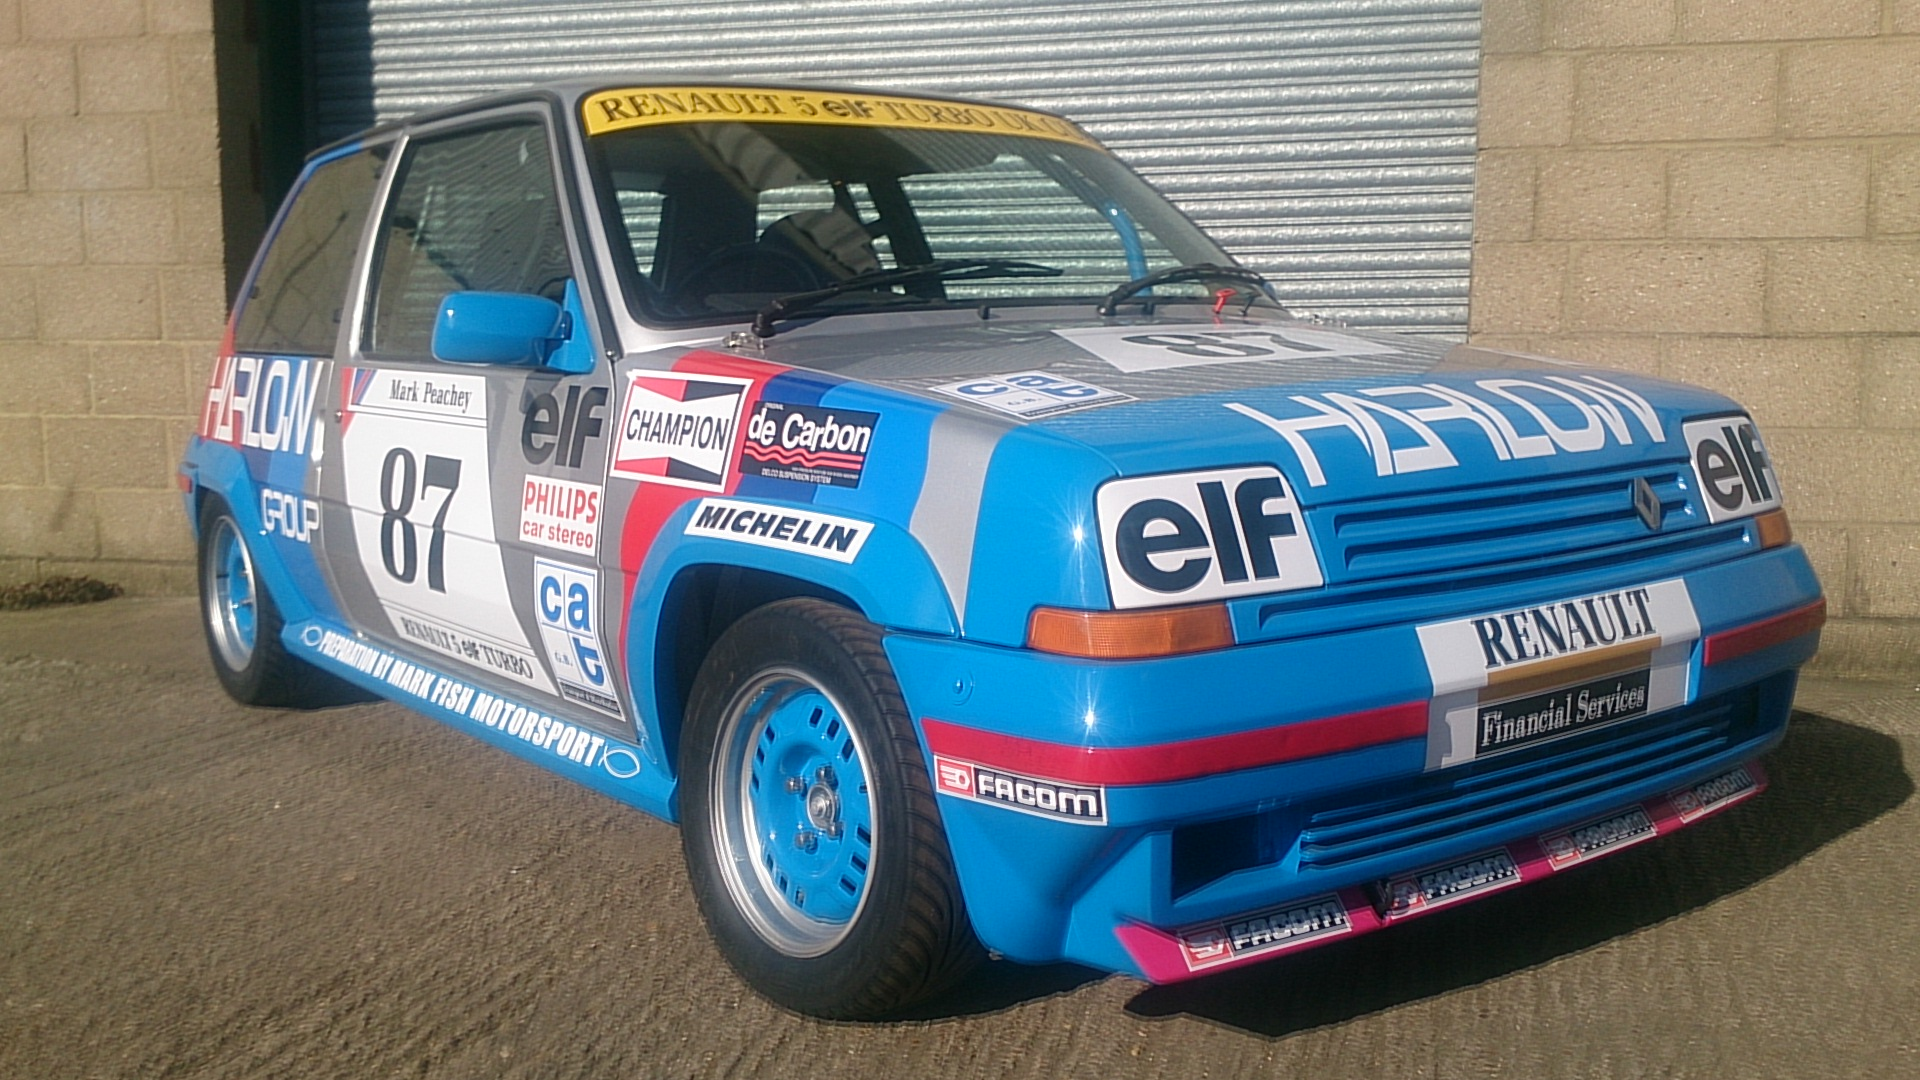 Renault 5gt Turbo Cup Rebuild Mark Fish Motorsport